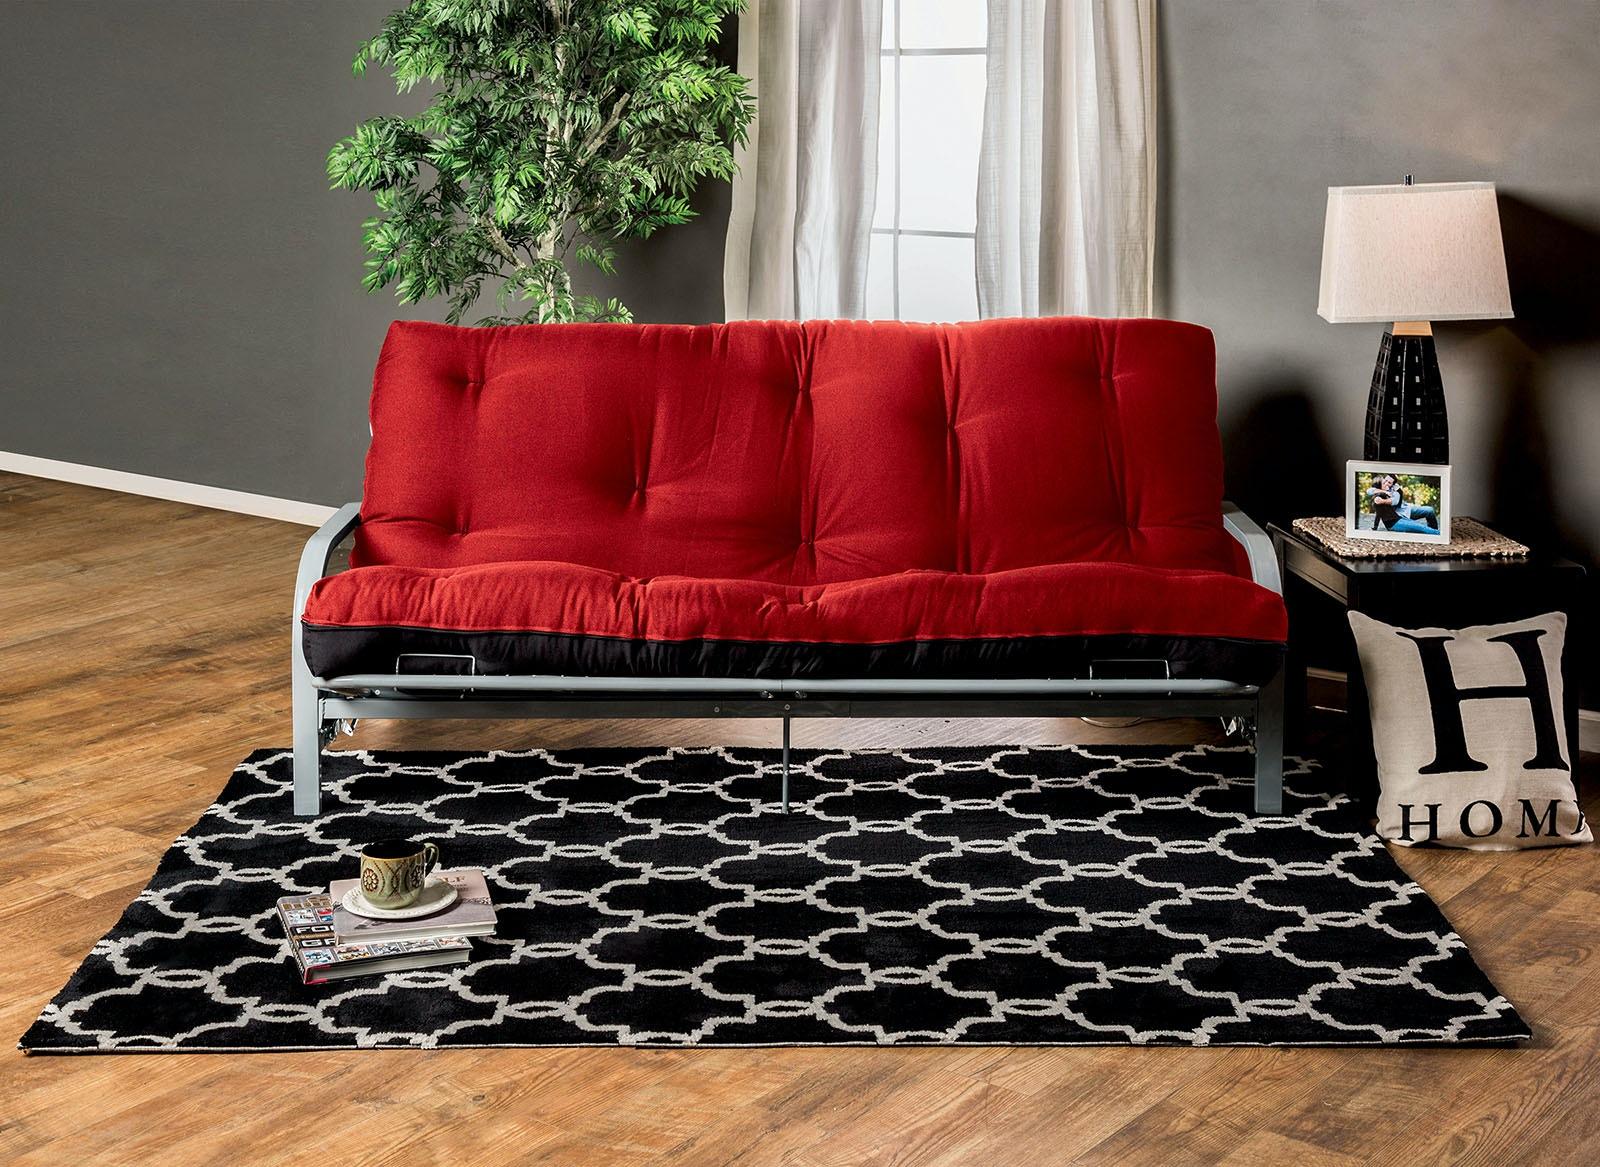 Furniture of America 8 Red/Black Futon Mattress FP-2415BR